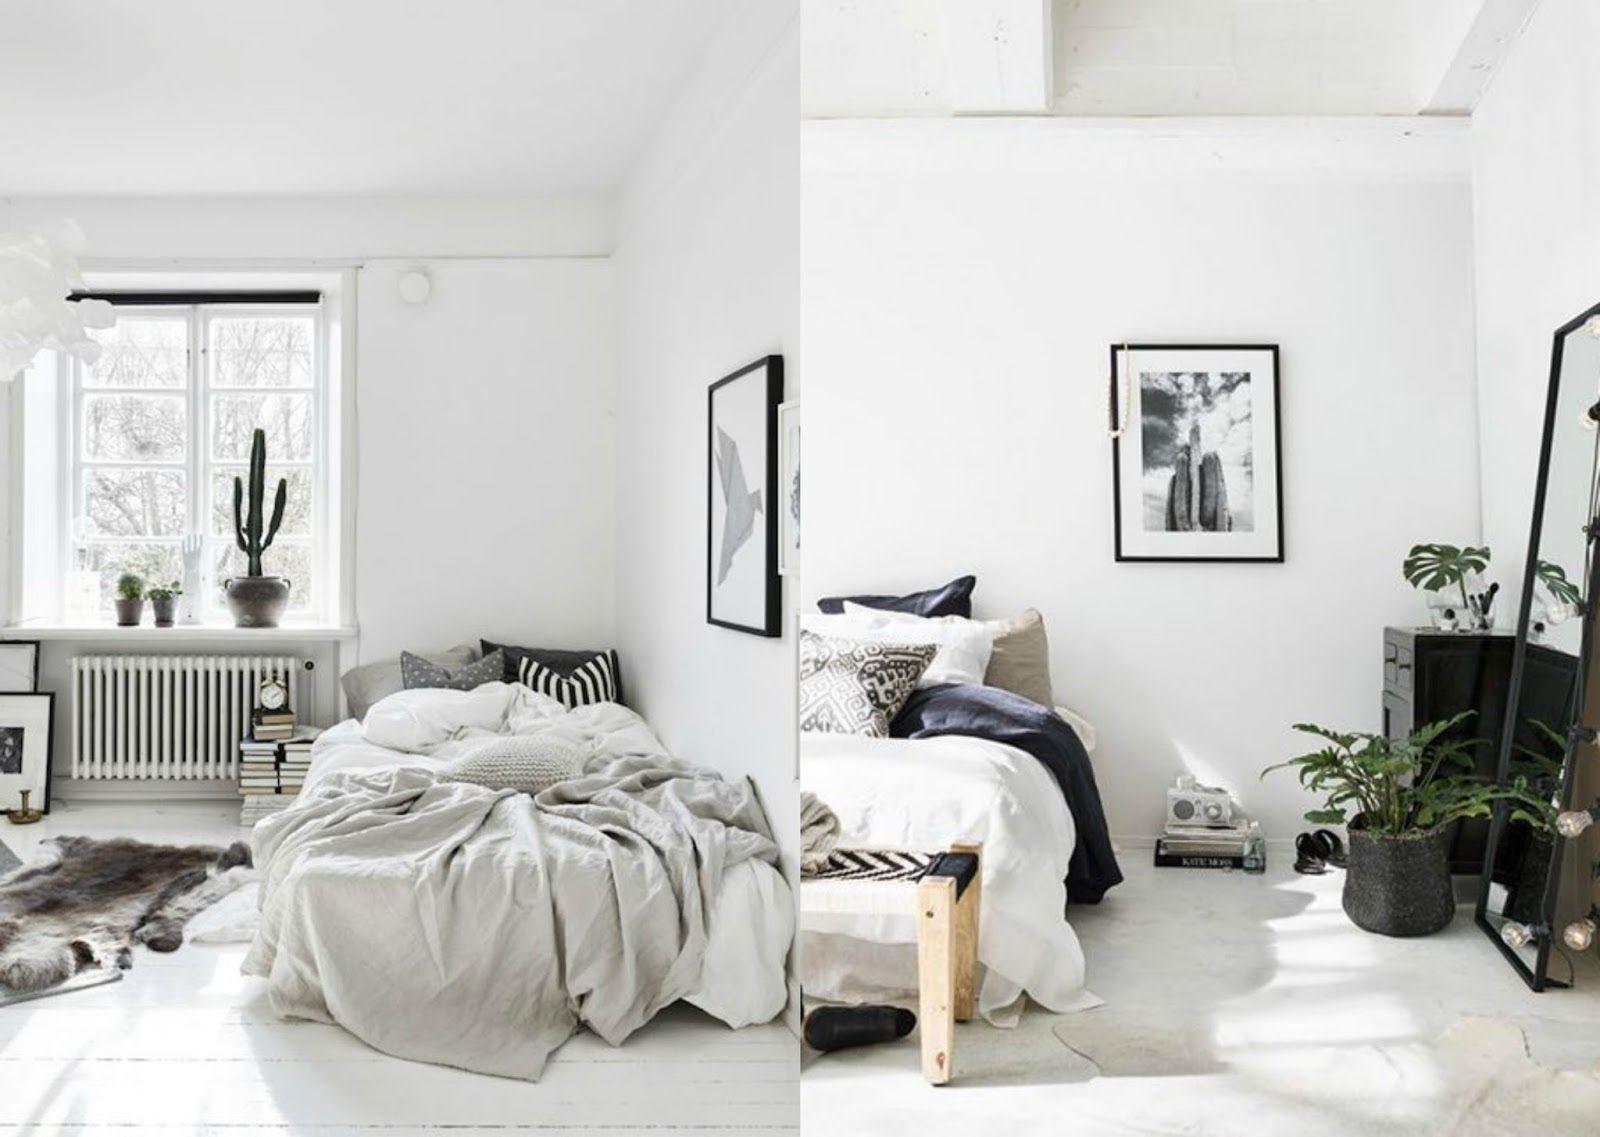 pinterest bedroom inspiration see the stars blog ideas designs ...